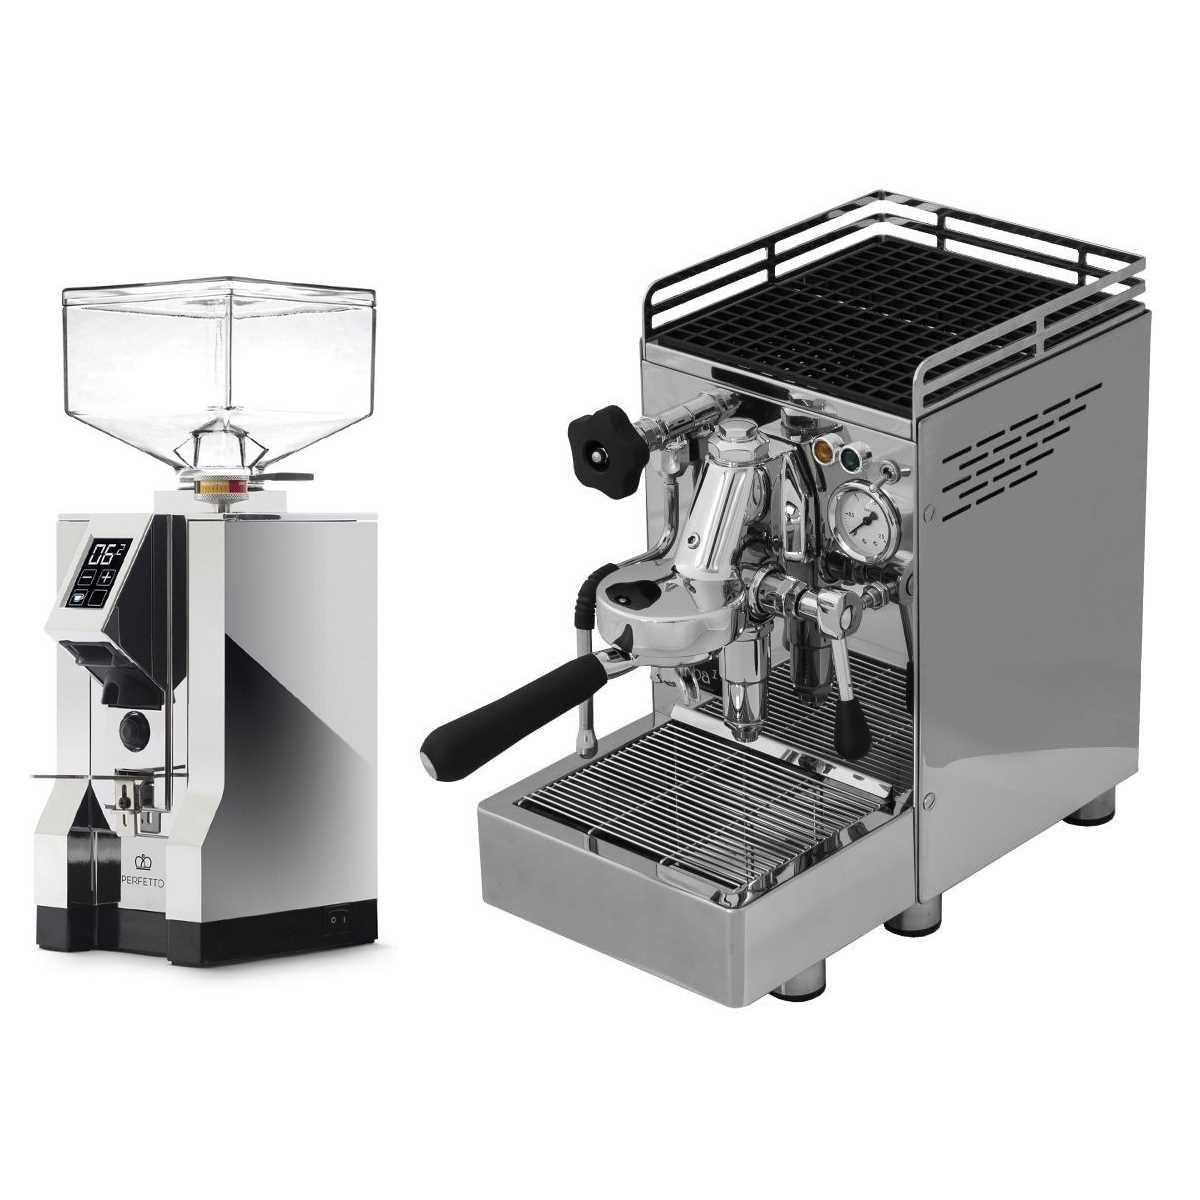 Macchina da caffè 969.coffee Elba1 Lux + Macinacaffè Eureka Mignon Specialita' 16CR - Cromo